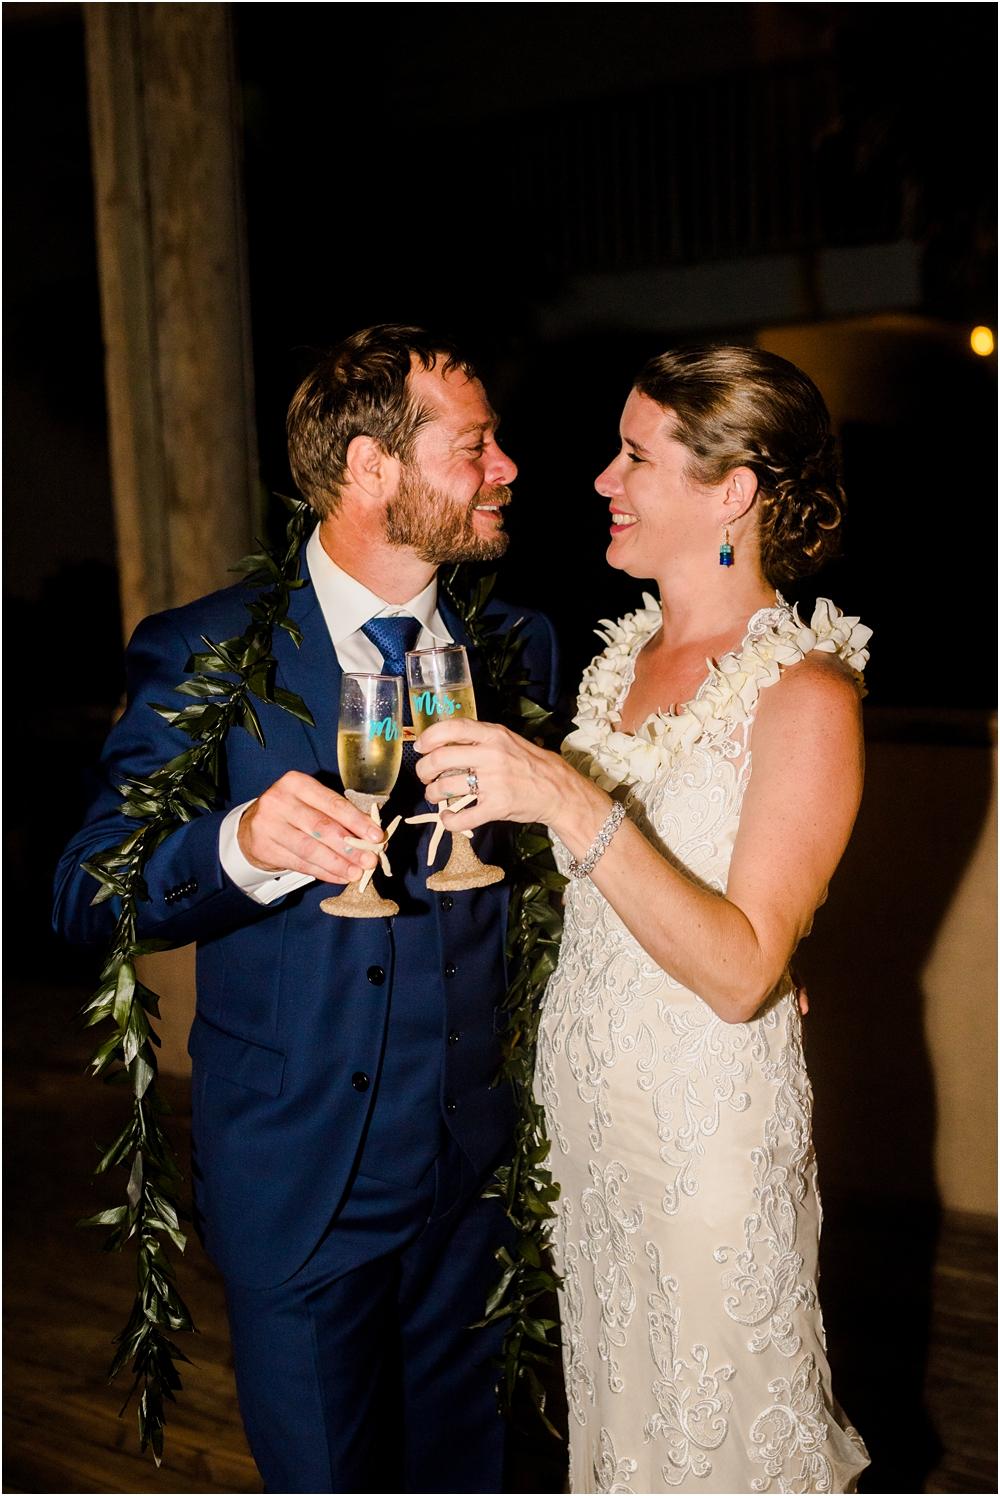 ledman-wedding-kiersten-stevenson-photography-30a-panama-city-beach-dothan-tallahassee-(644-of-763).JPG